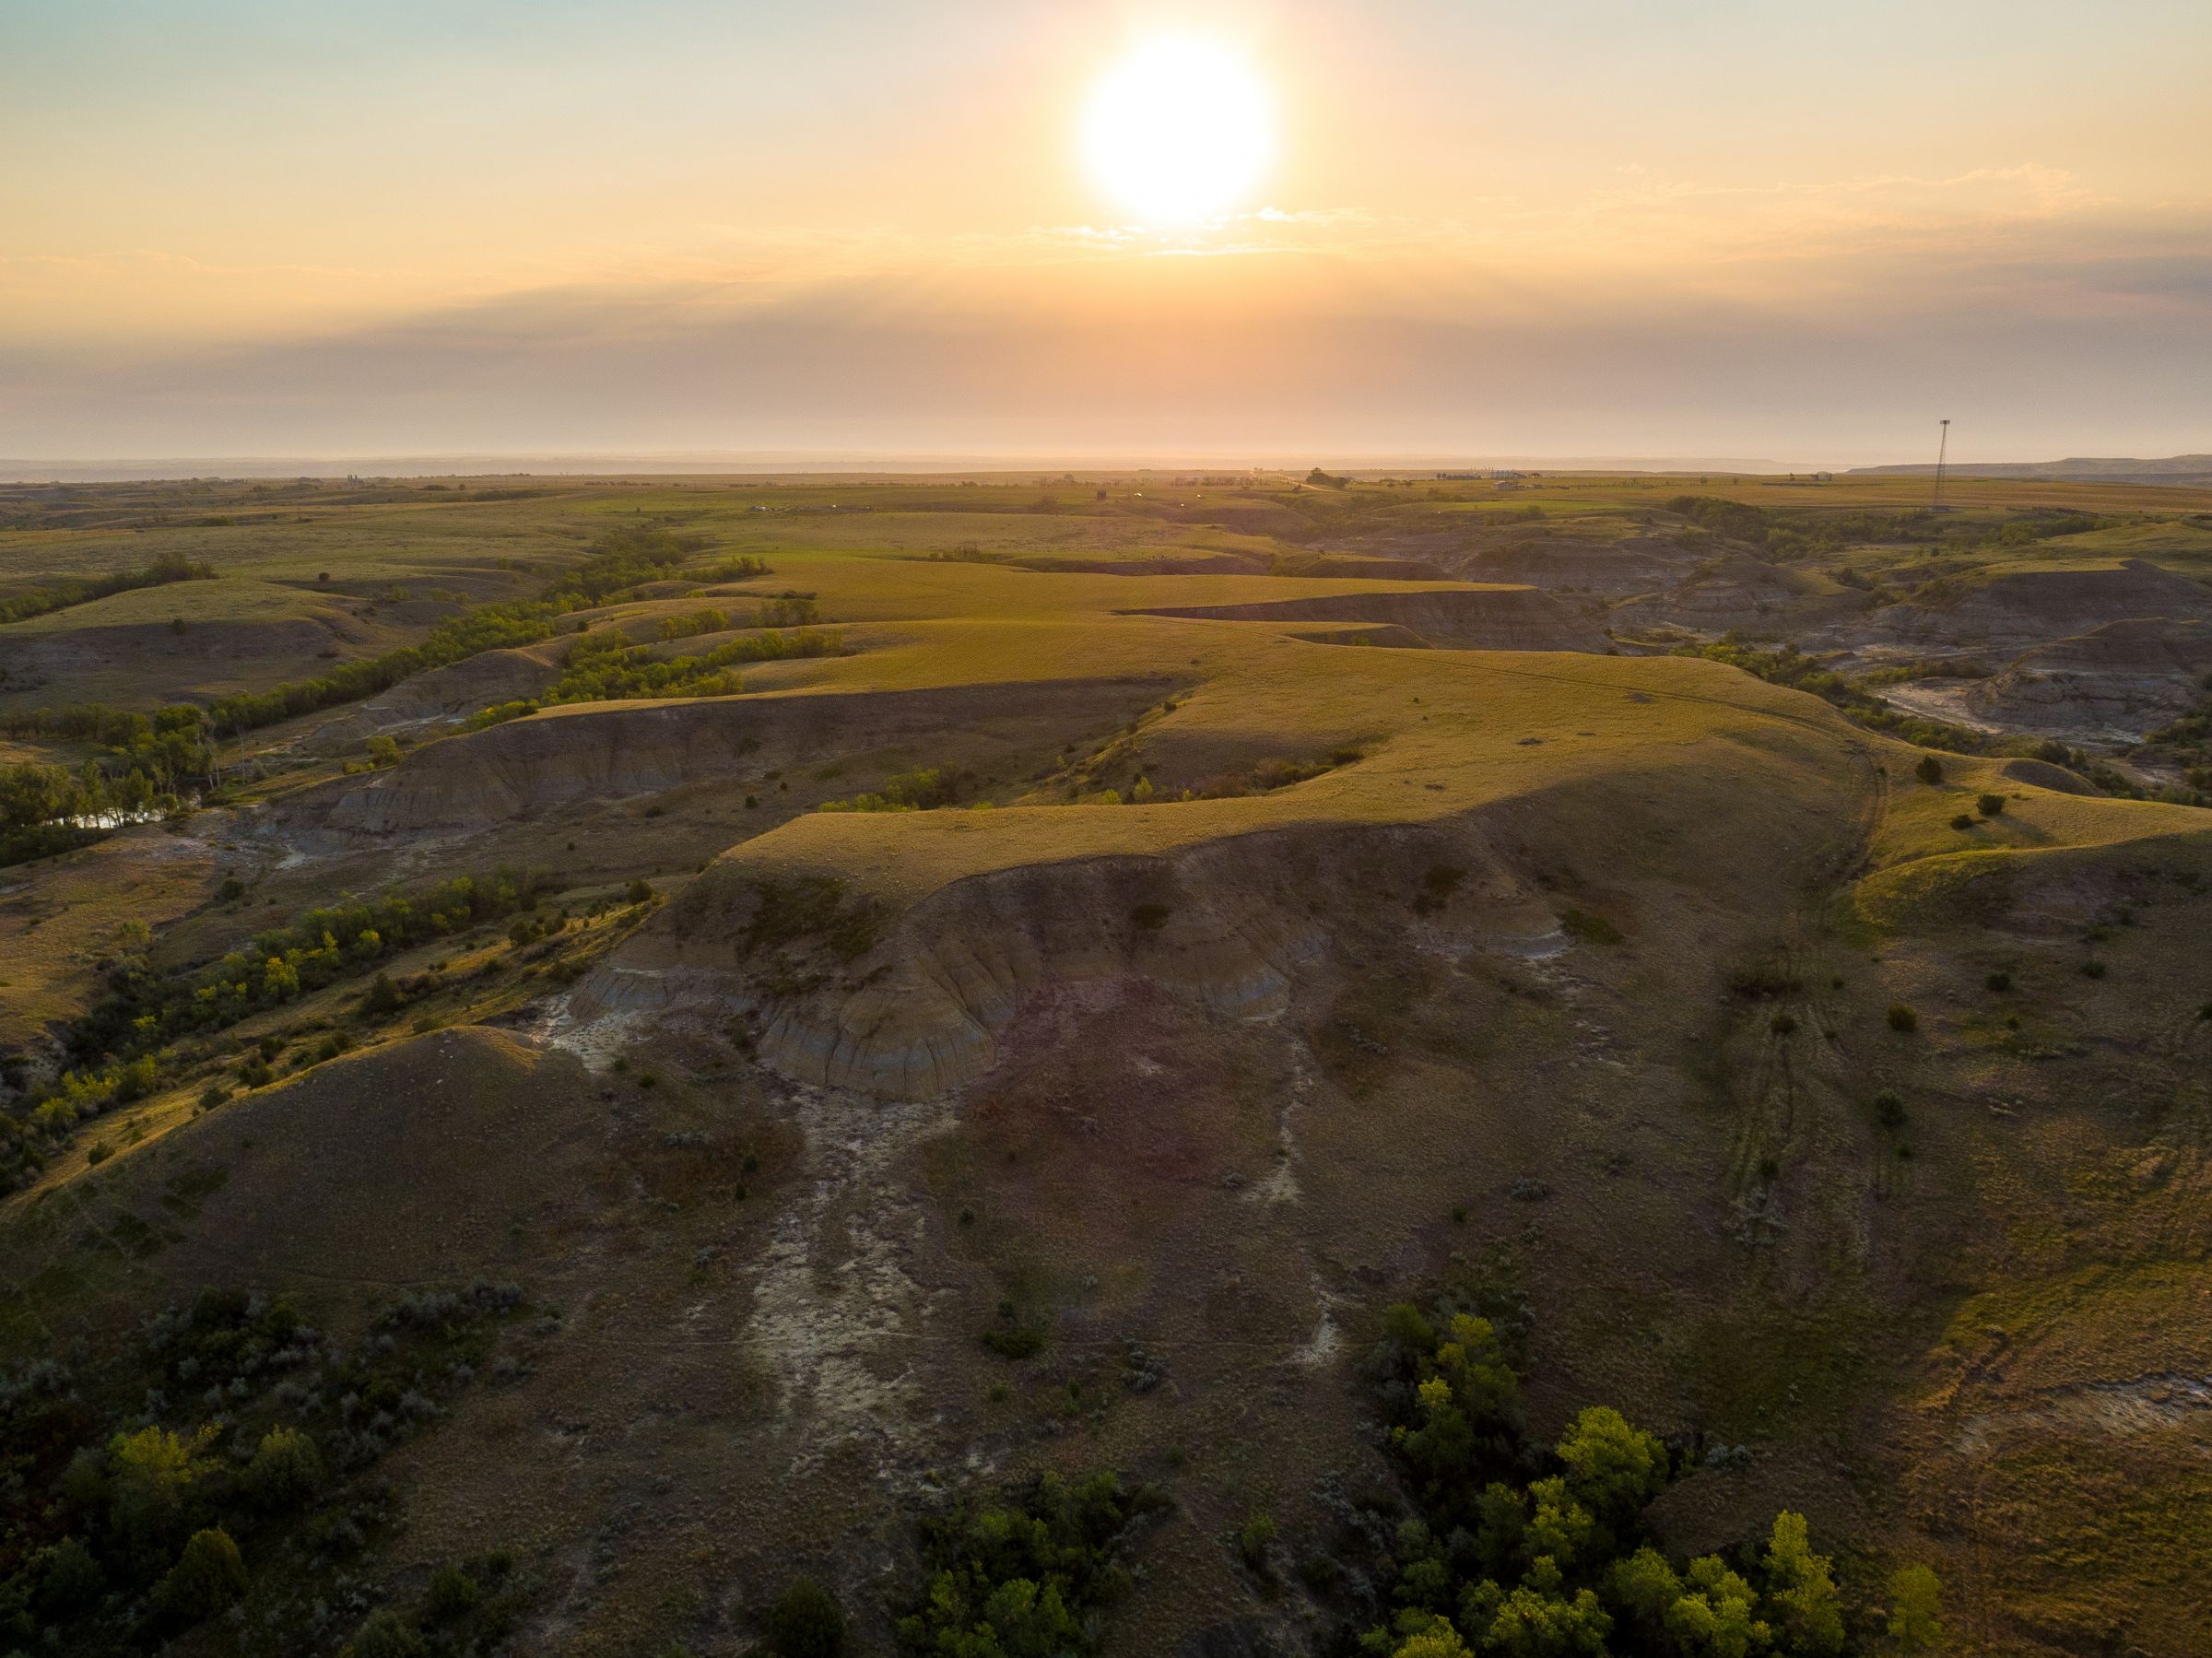 auctions-land-mckenzie-county-north-dakota-270-acres-listing-number-15735-1-2021-09-10-135952.jpeg